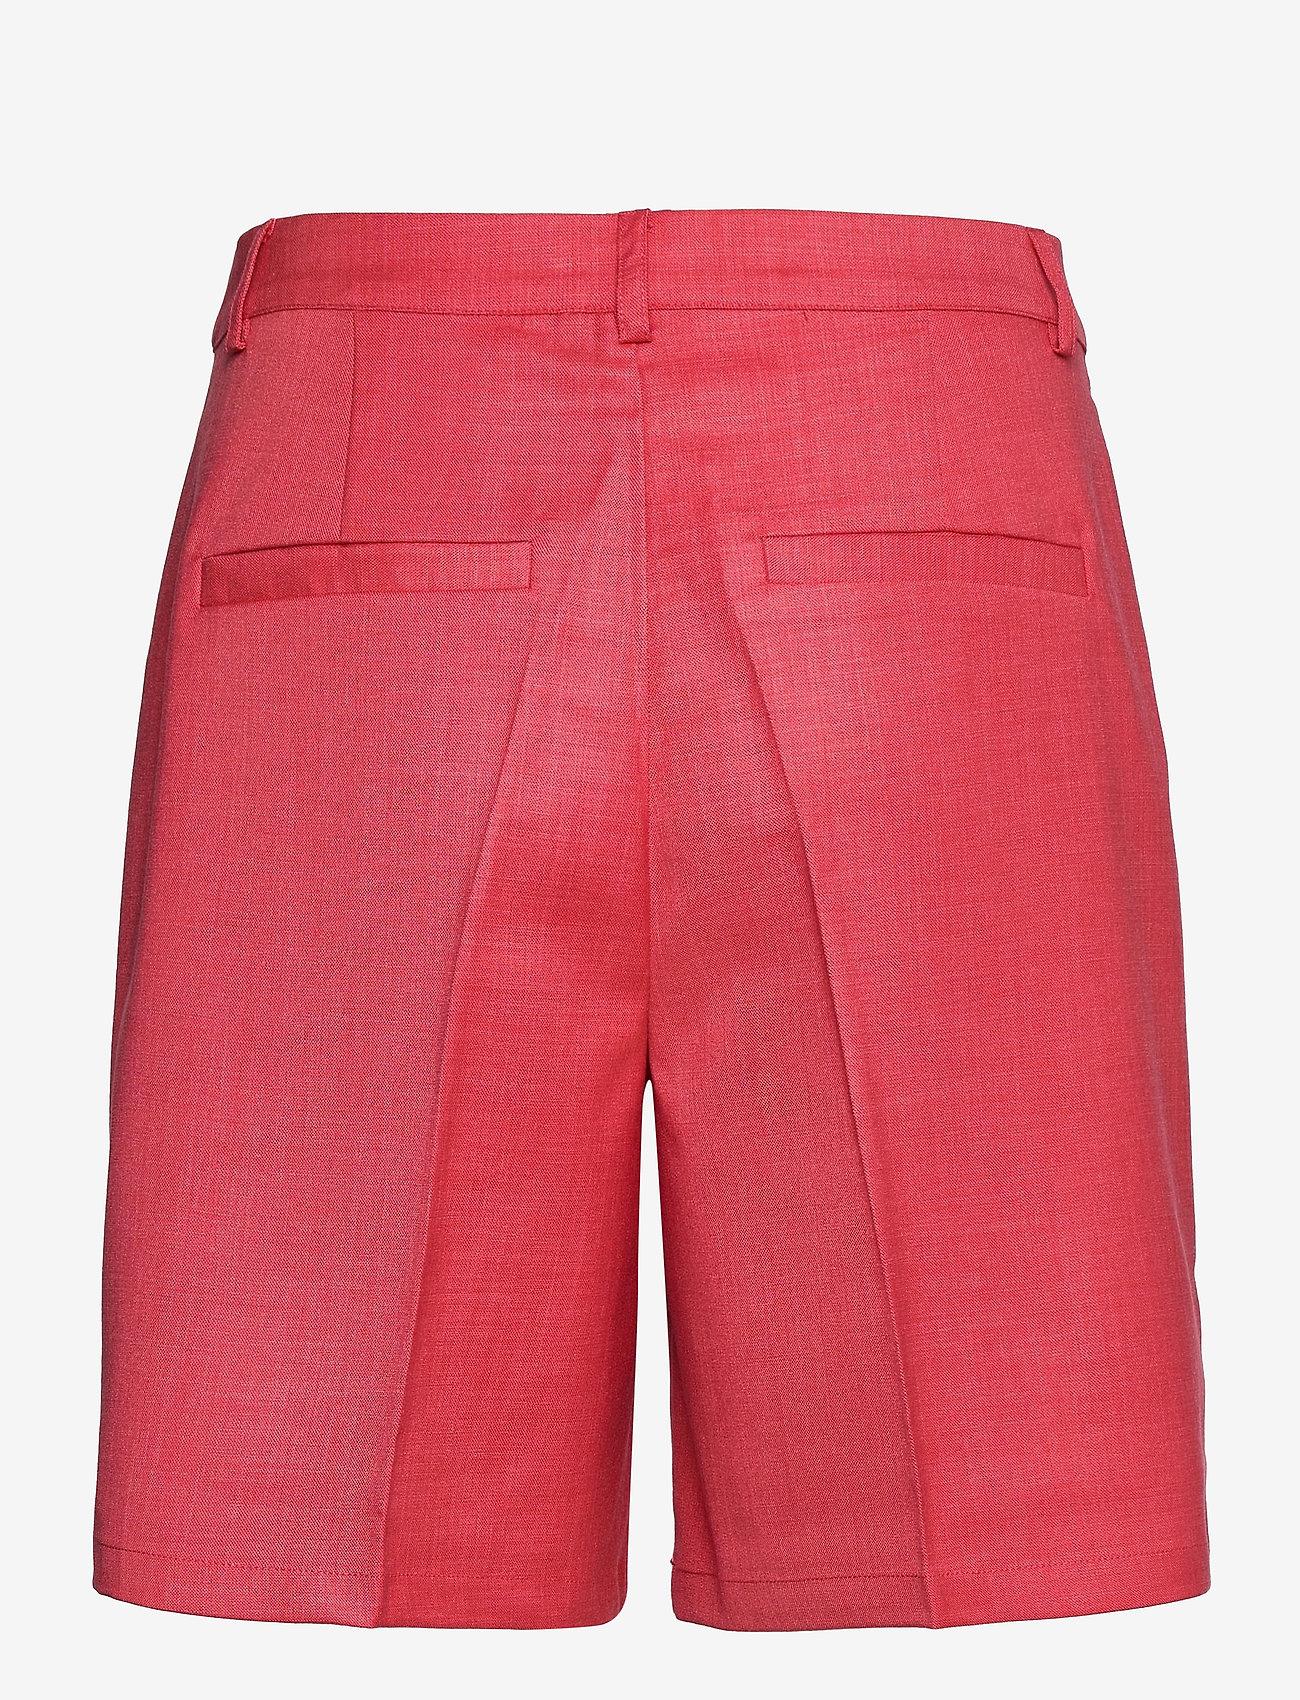 Résumé - ElodieRS - chino shorts - red - 1